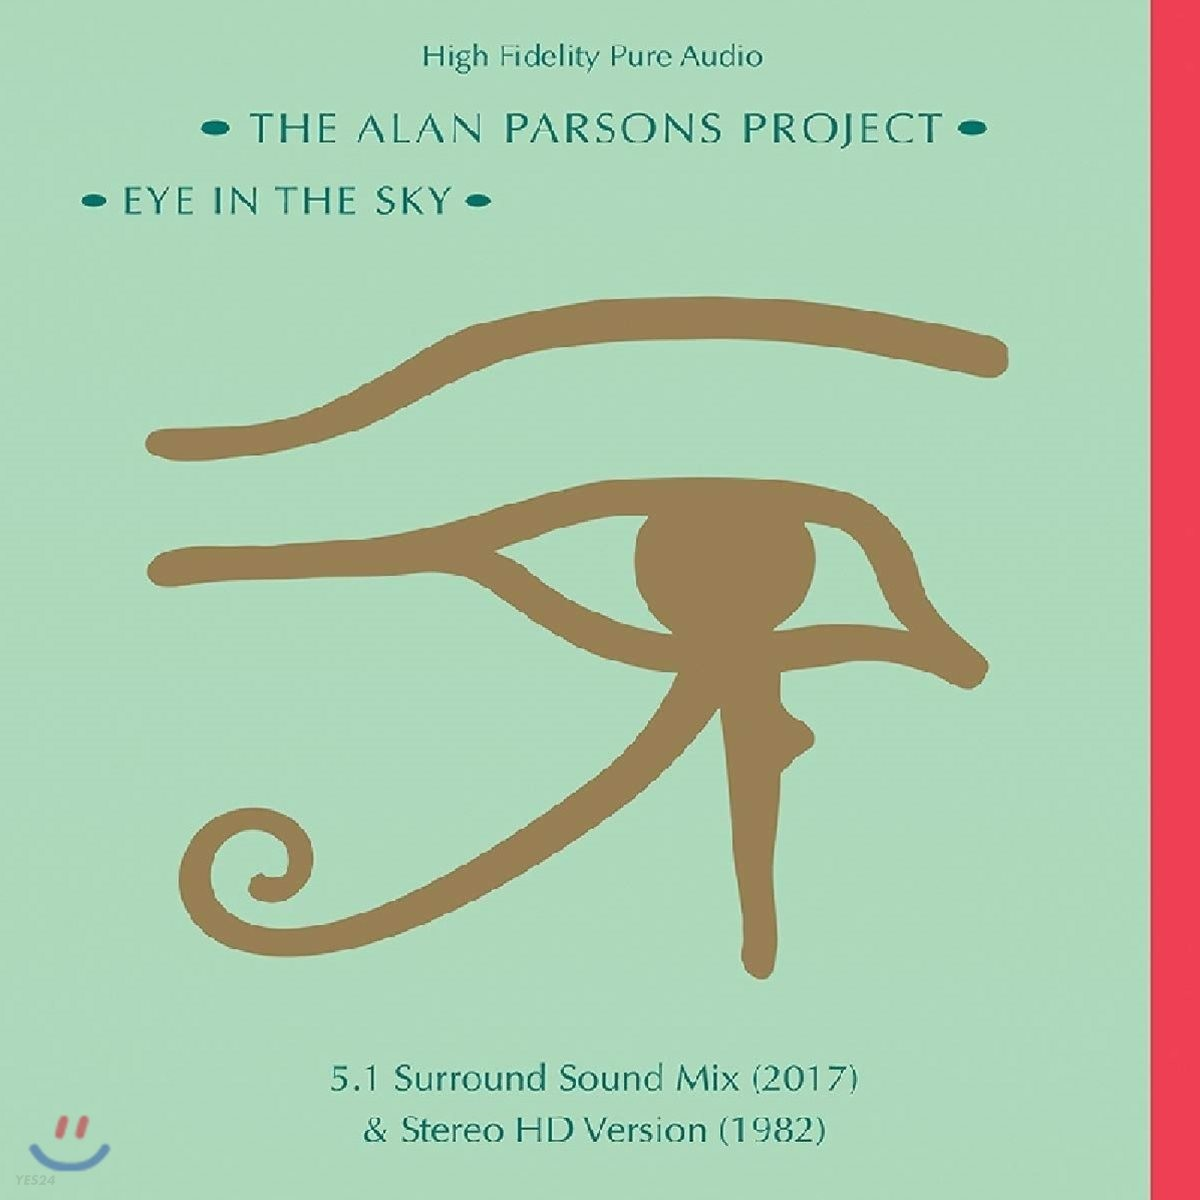 Alan Parsons Project (알란 파슨스 프로젝트) - Eye In The Sky [발매 35주년 기념 블루레이 오디오]